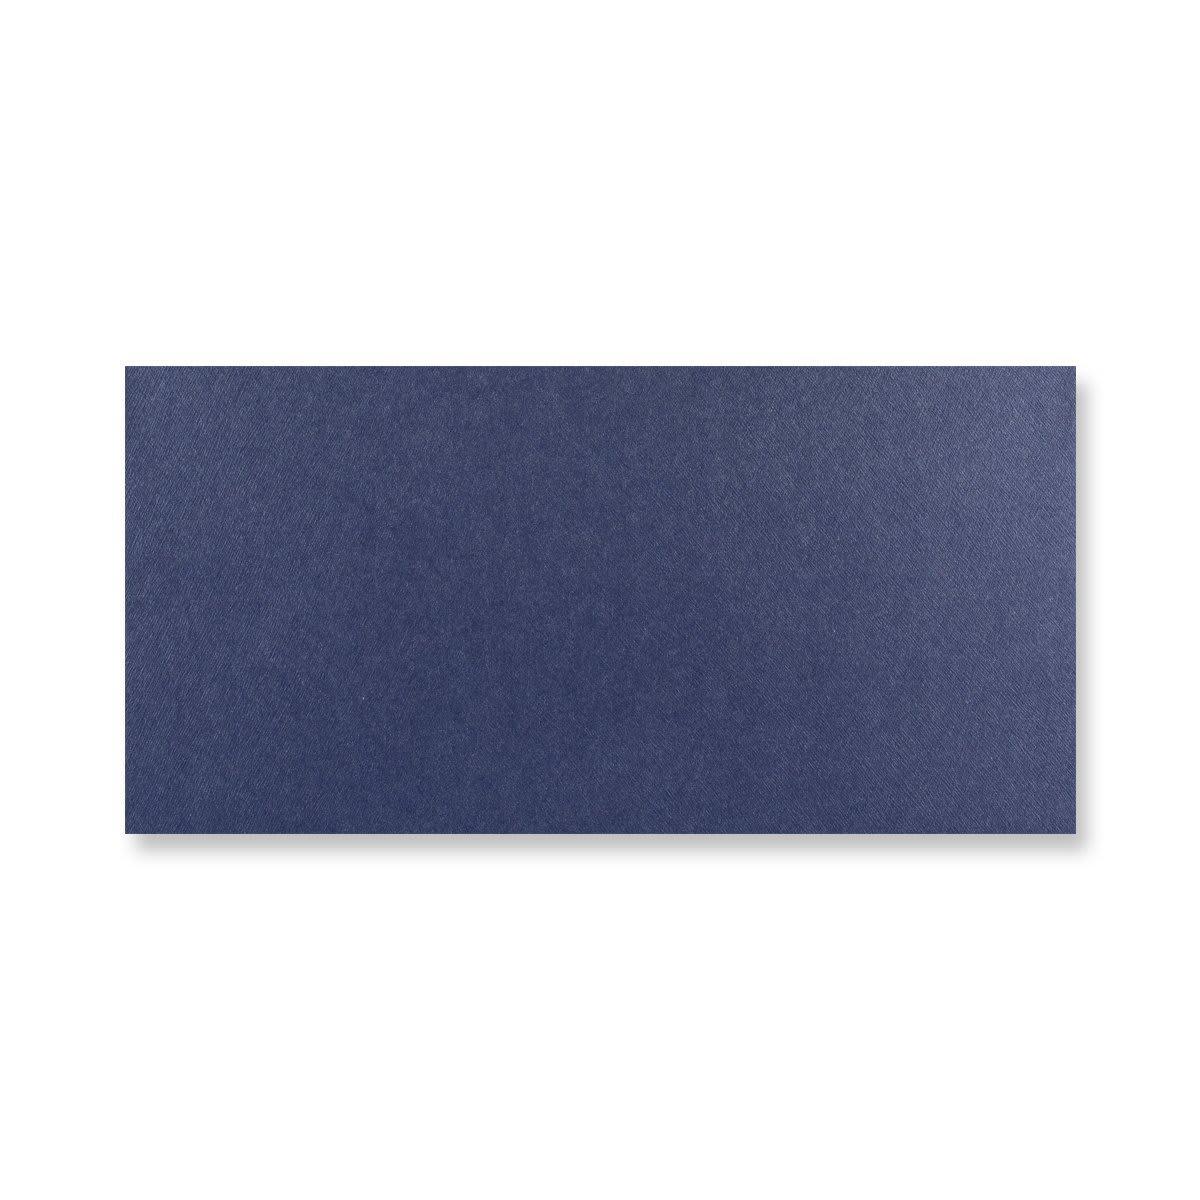 DL MIDNIGHT BLUE BUTTERFLY ENVELOPES